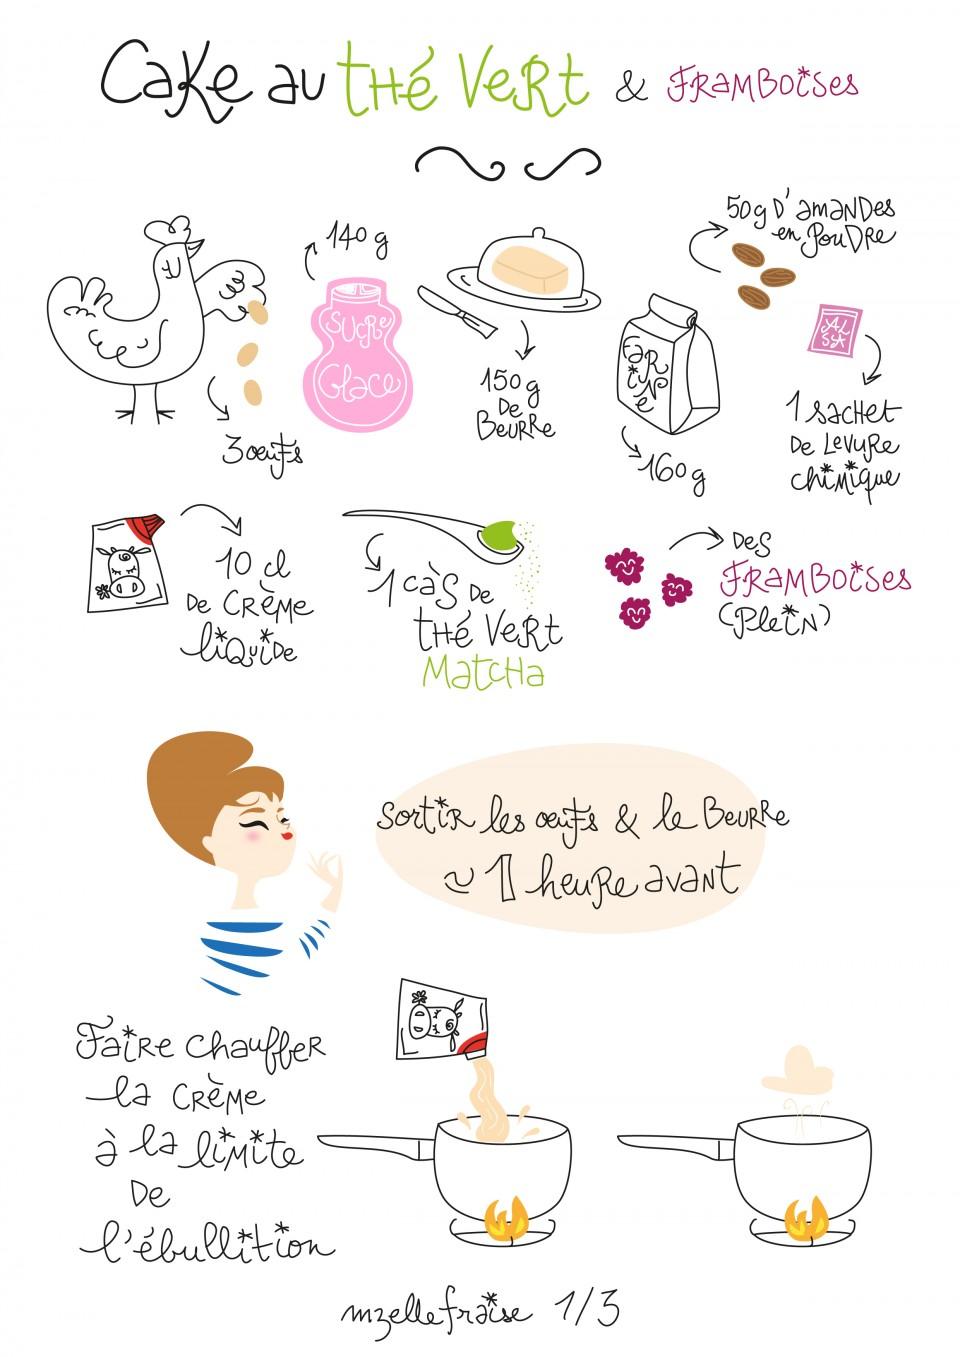 recette-cake-01